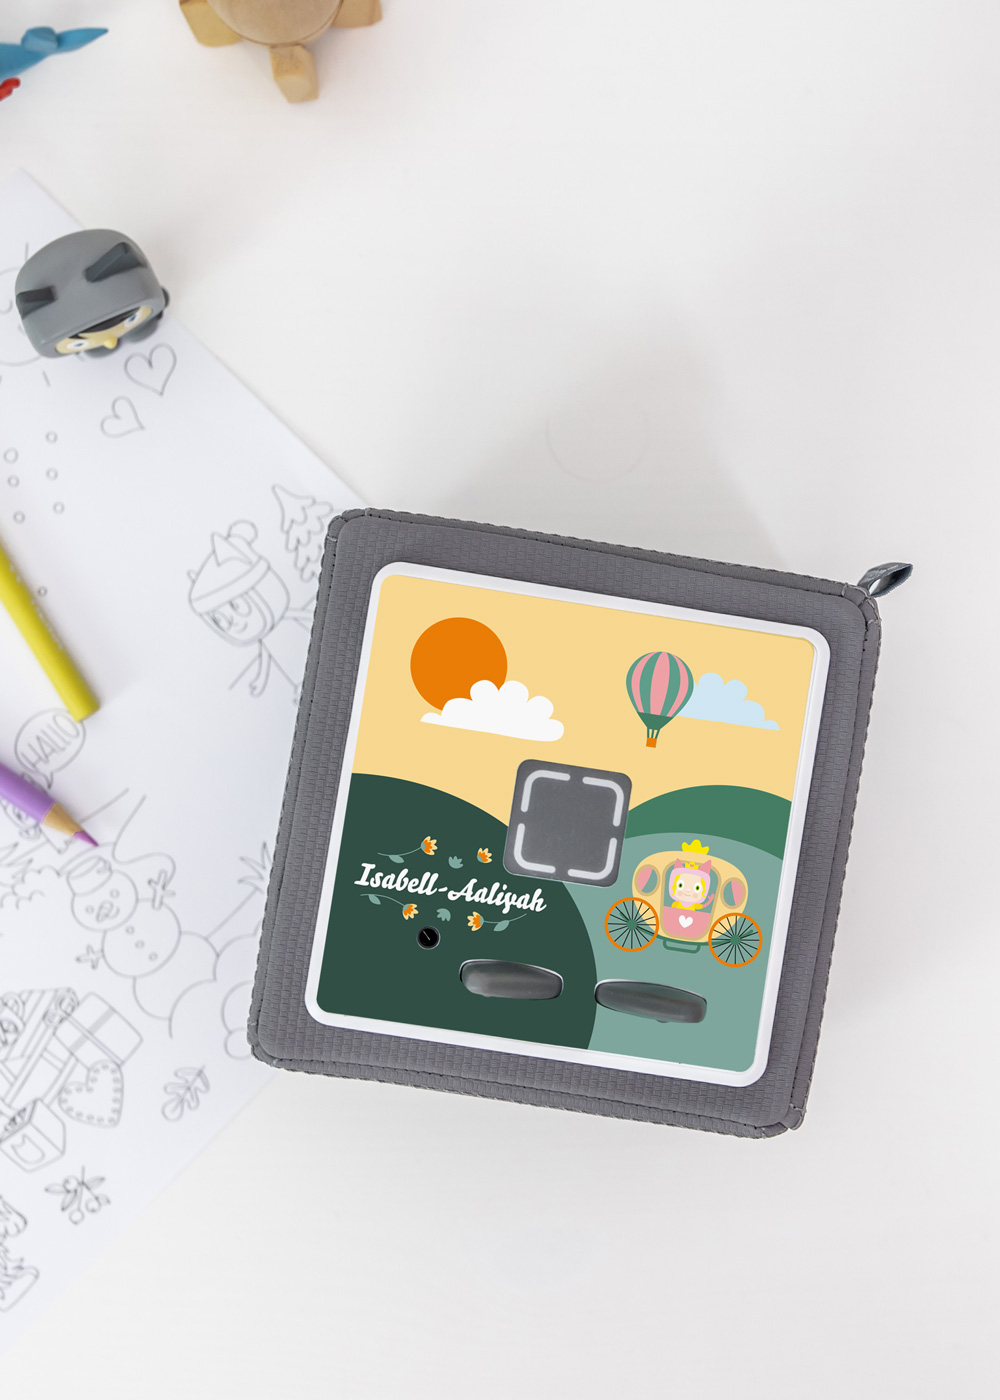 dekofolie toniebox zauberfahrt personalisiert kindername 2